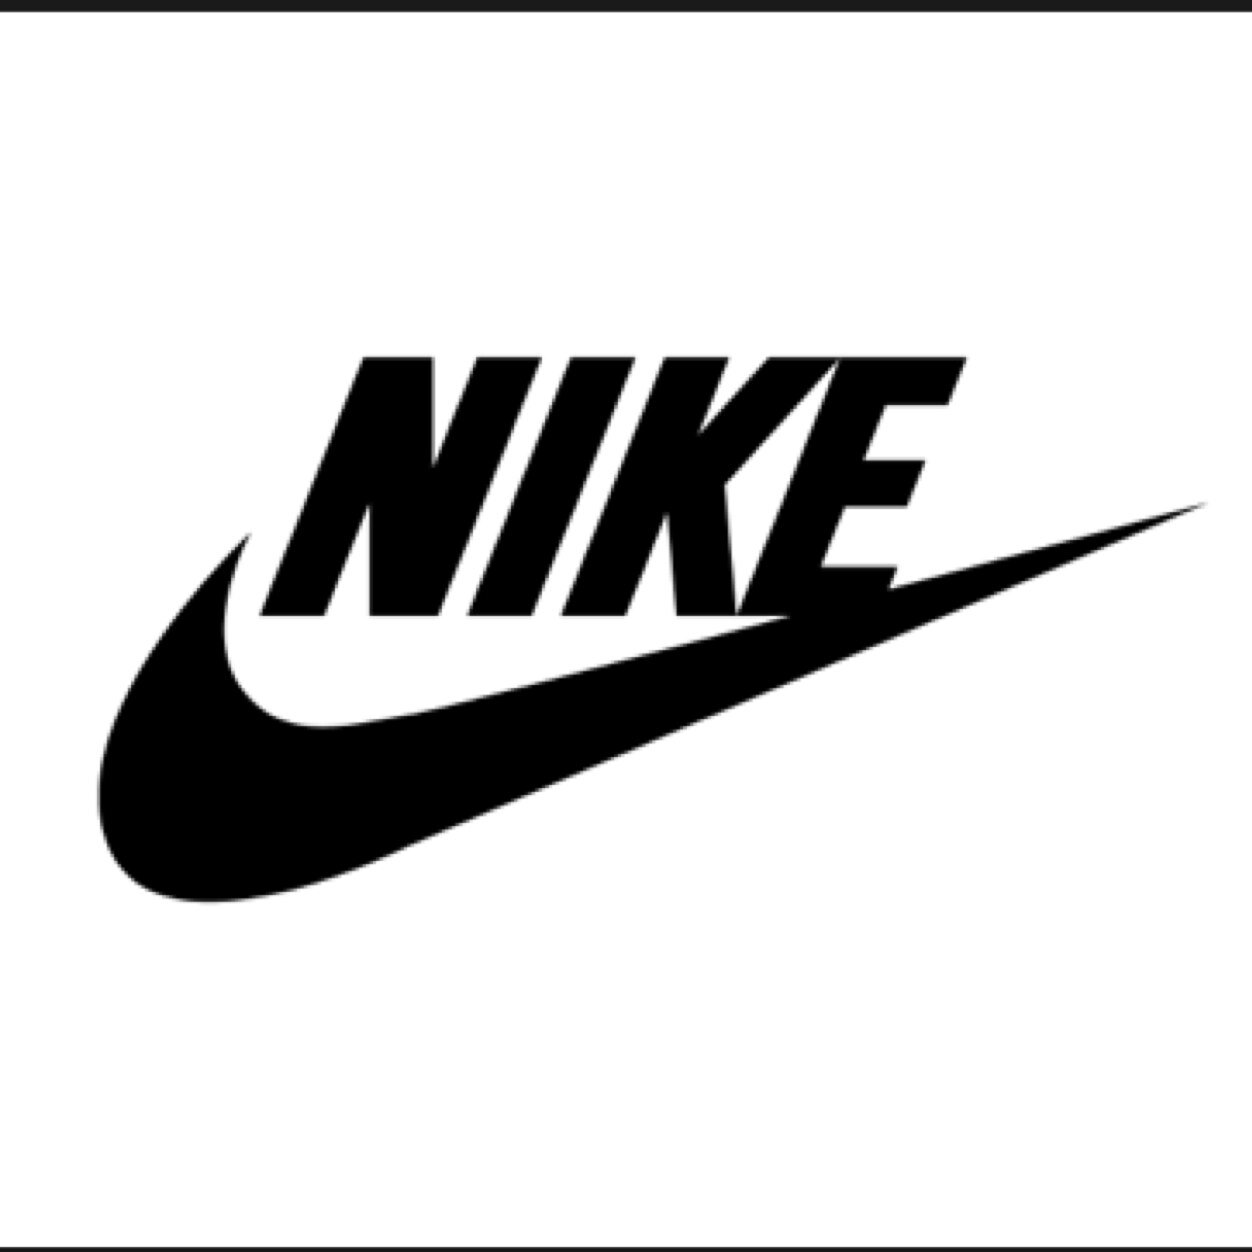 nike logo drawing at getdrawings com free for personal use nike rh getdrawings com how to draw nike logo 3d step by step how to draw a cool nike logo